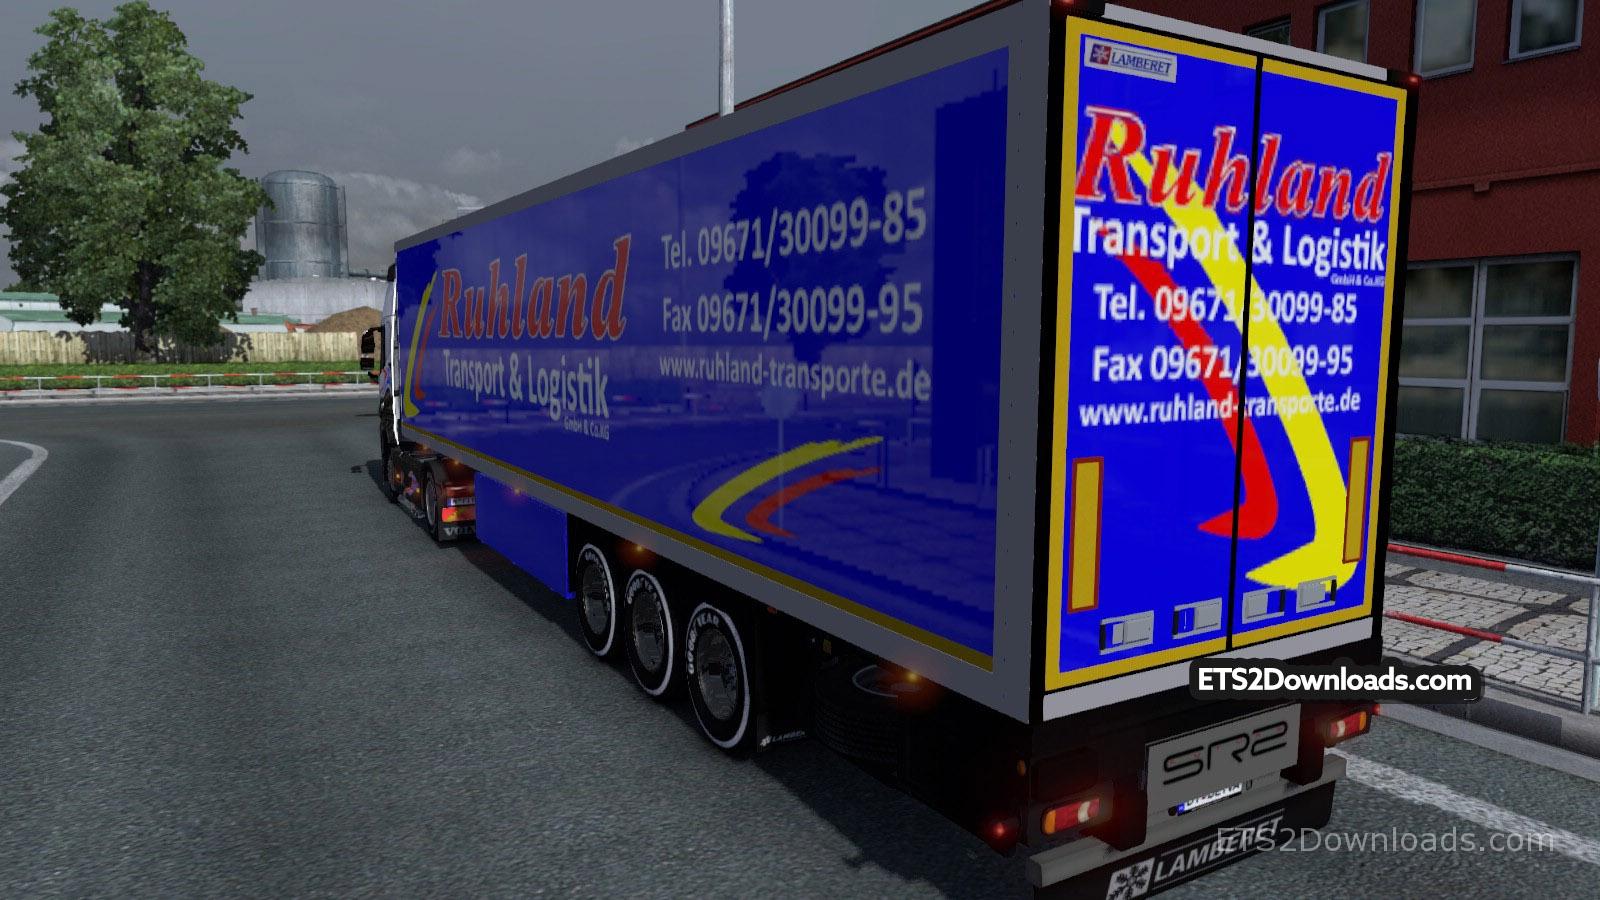 lamberet-ruhland-trailer